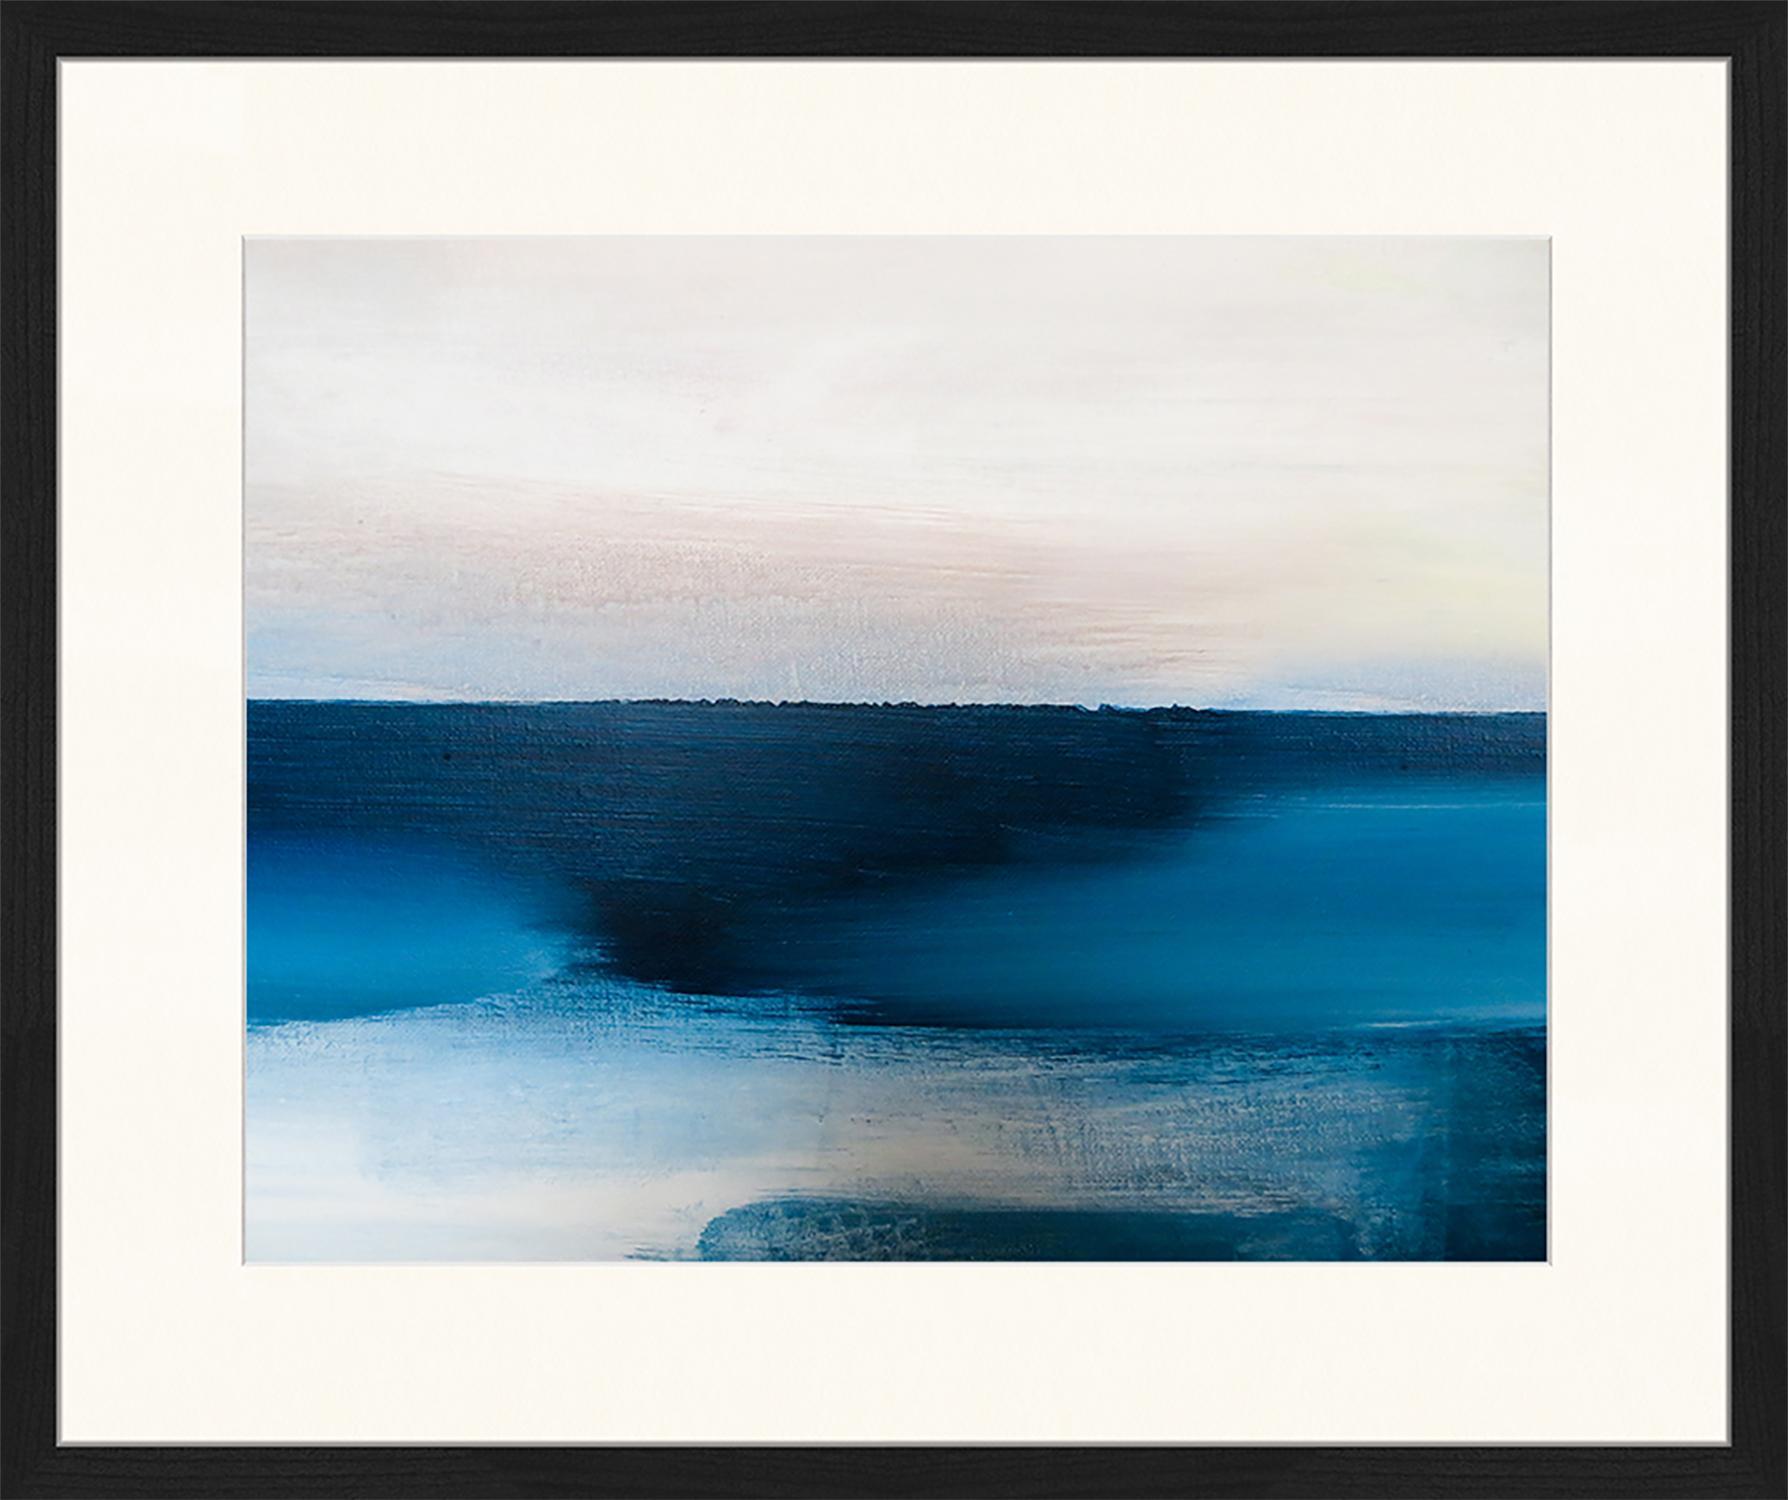 Ingelijste digitale print Blue And Grey Abstract Art, Afbeelding: digitale print op papier,, Lijst: gelakt hout, Multicolour, 63 x 53 cm